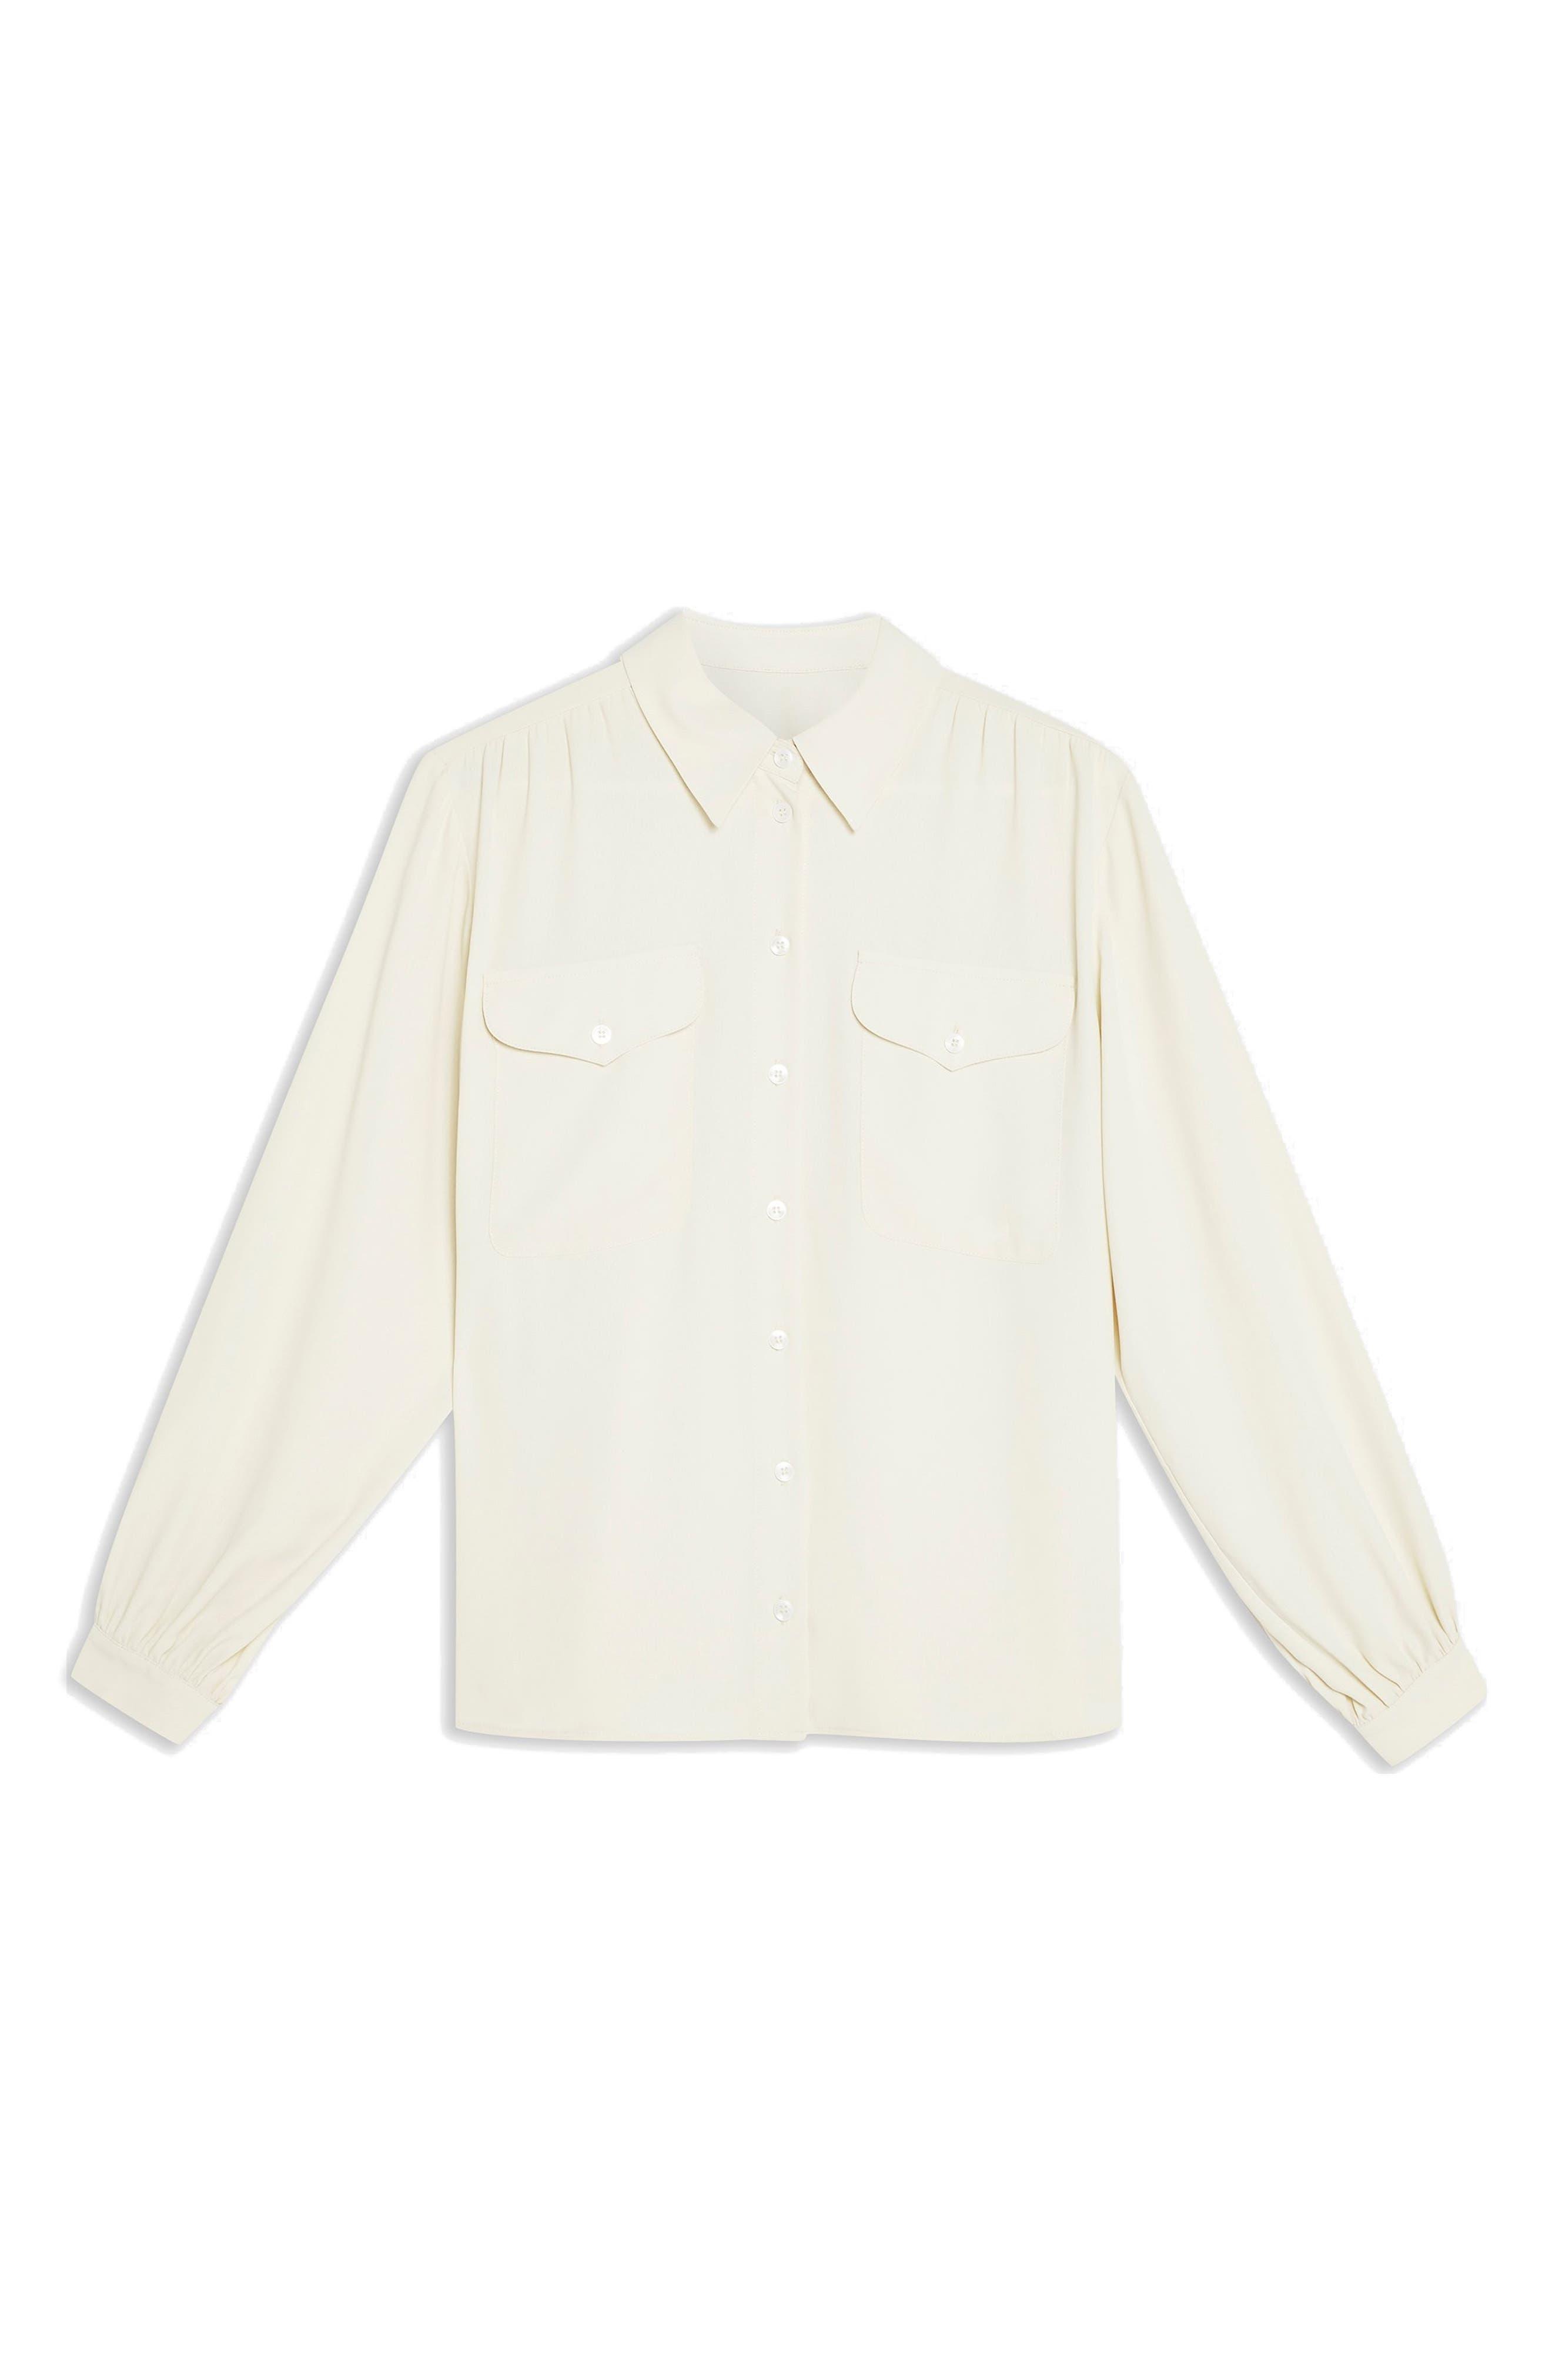 TOPSHOP, Smart Pocket Shirt, Alternate thumbnail 3, color, NUDE